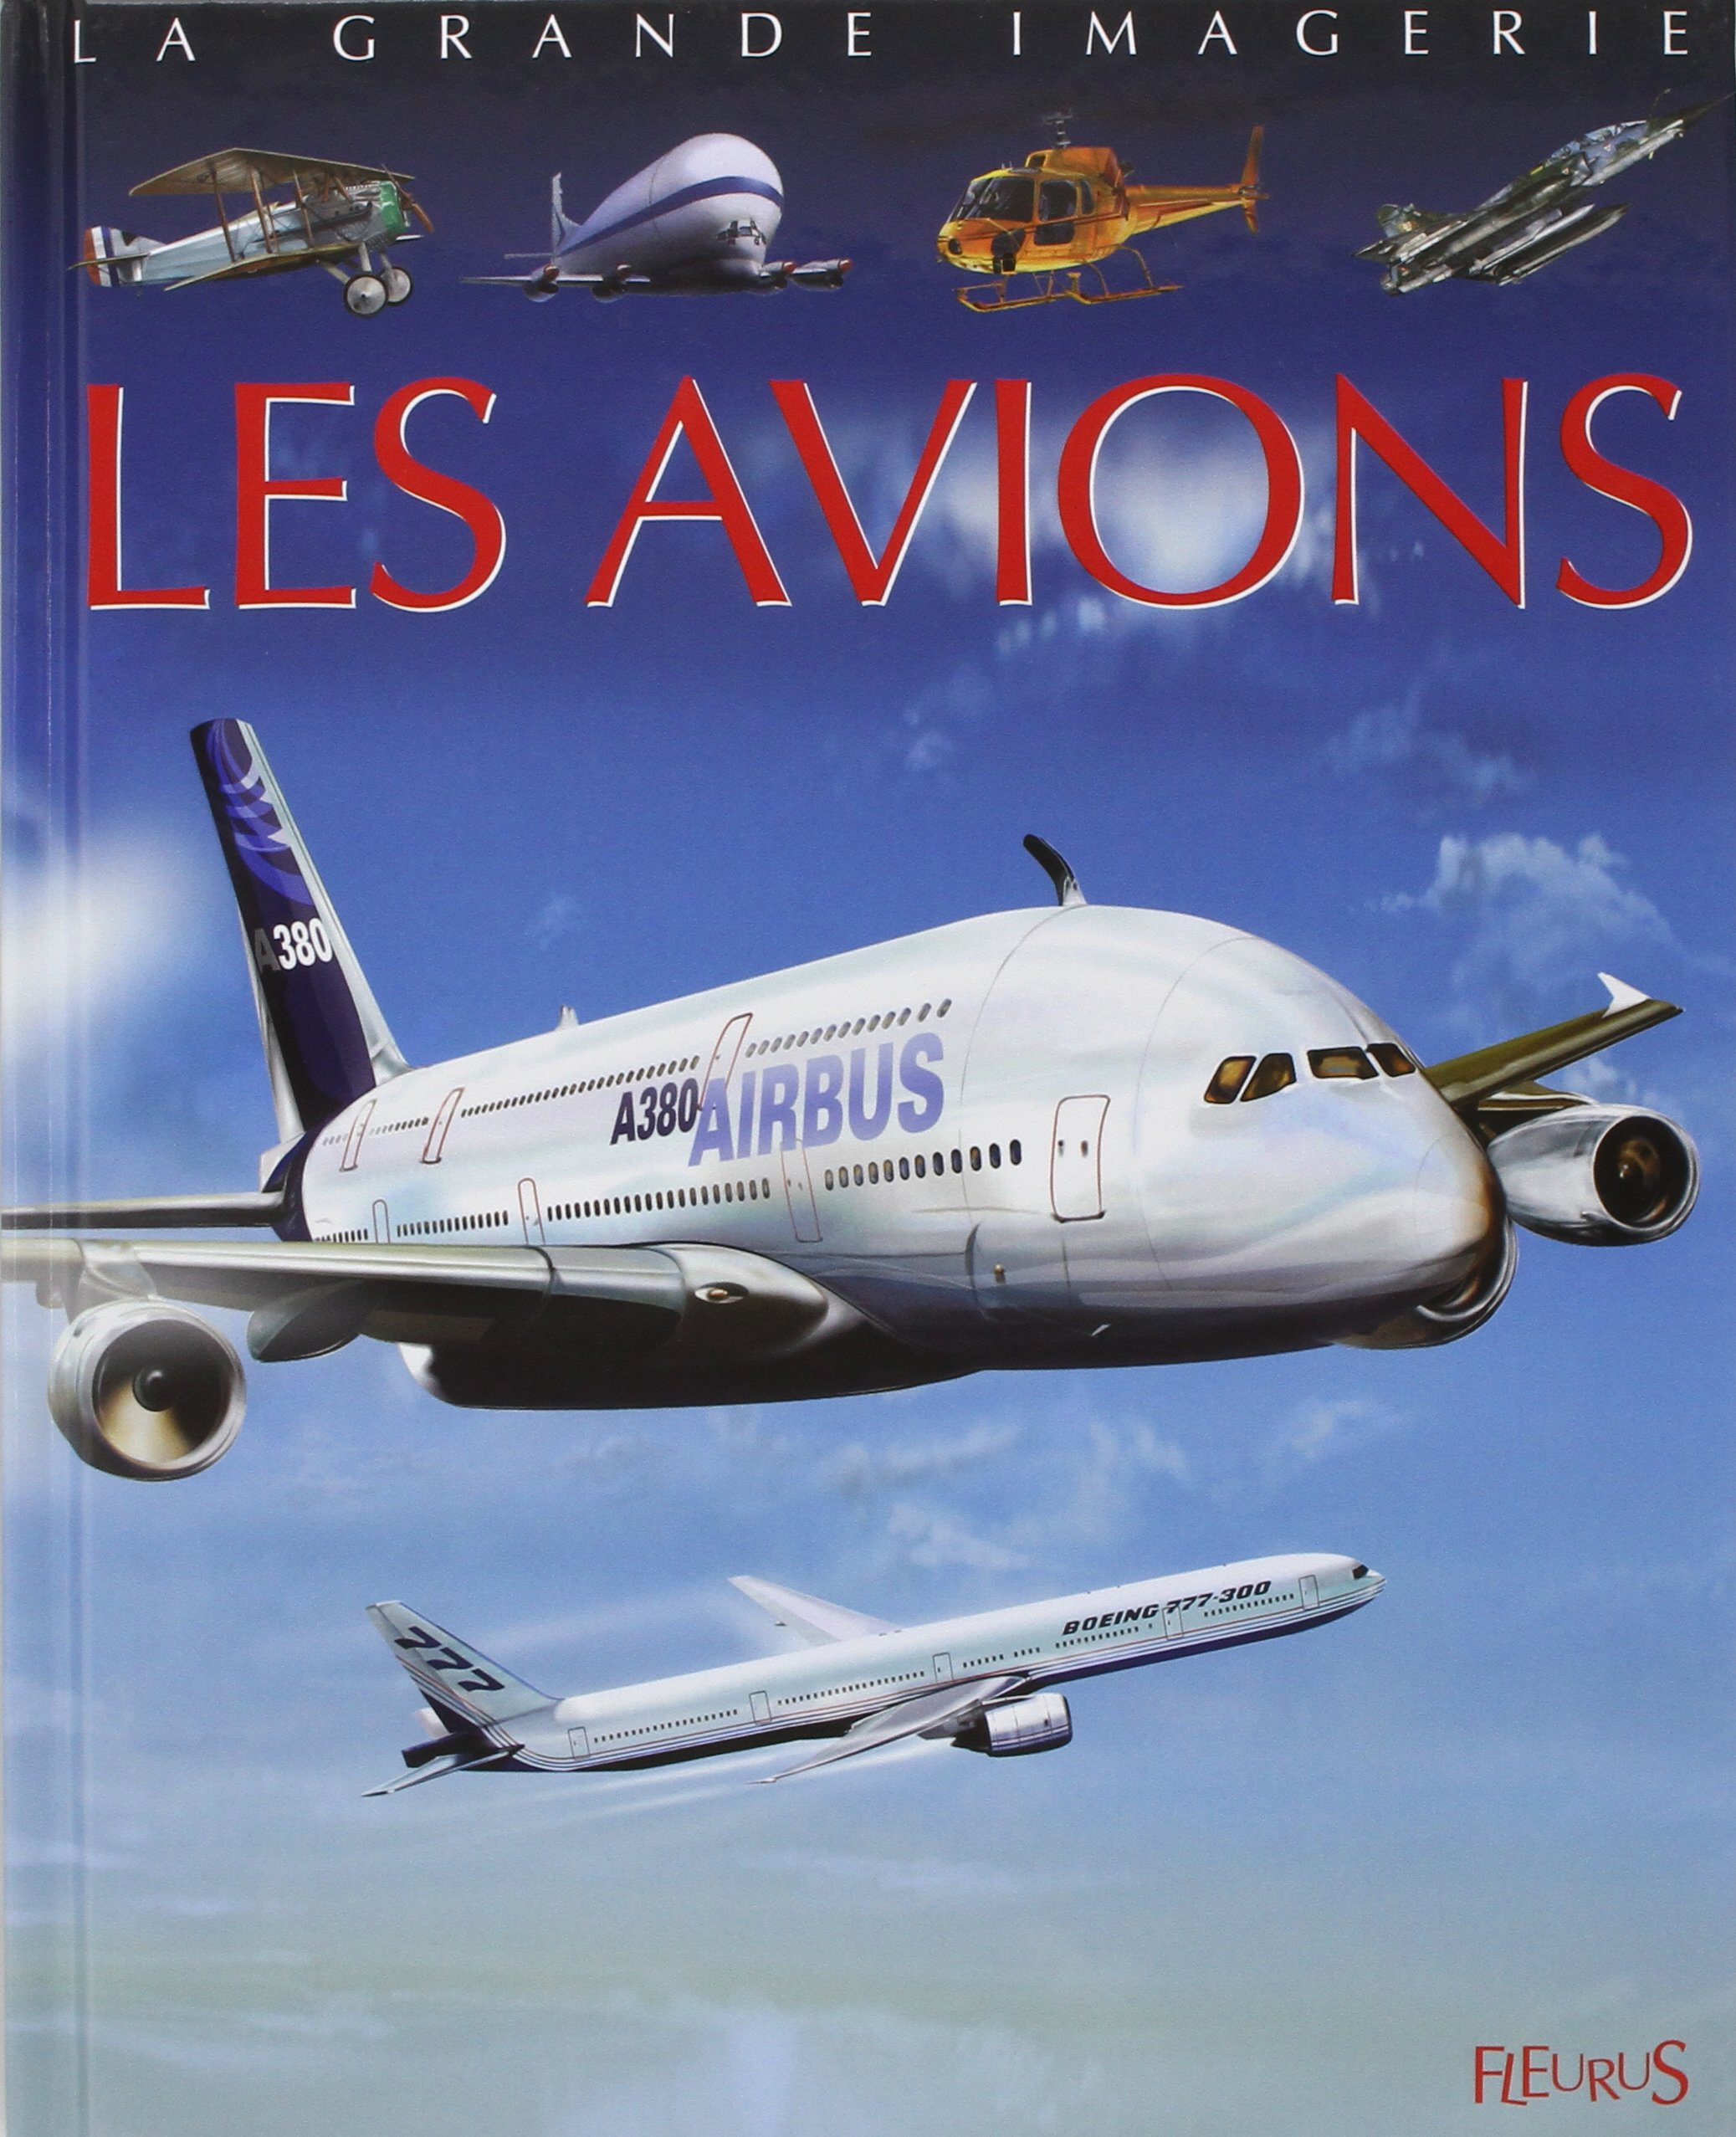 La Grande Imagerie Fleurus Les Avions French Edition